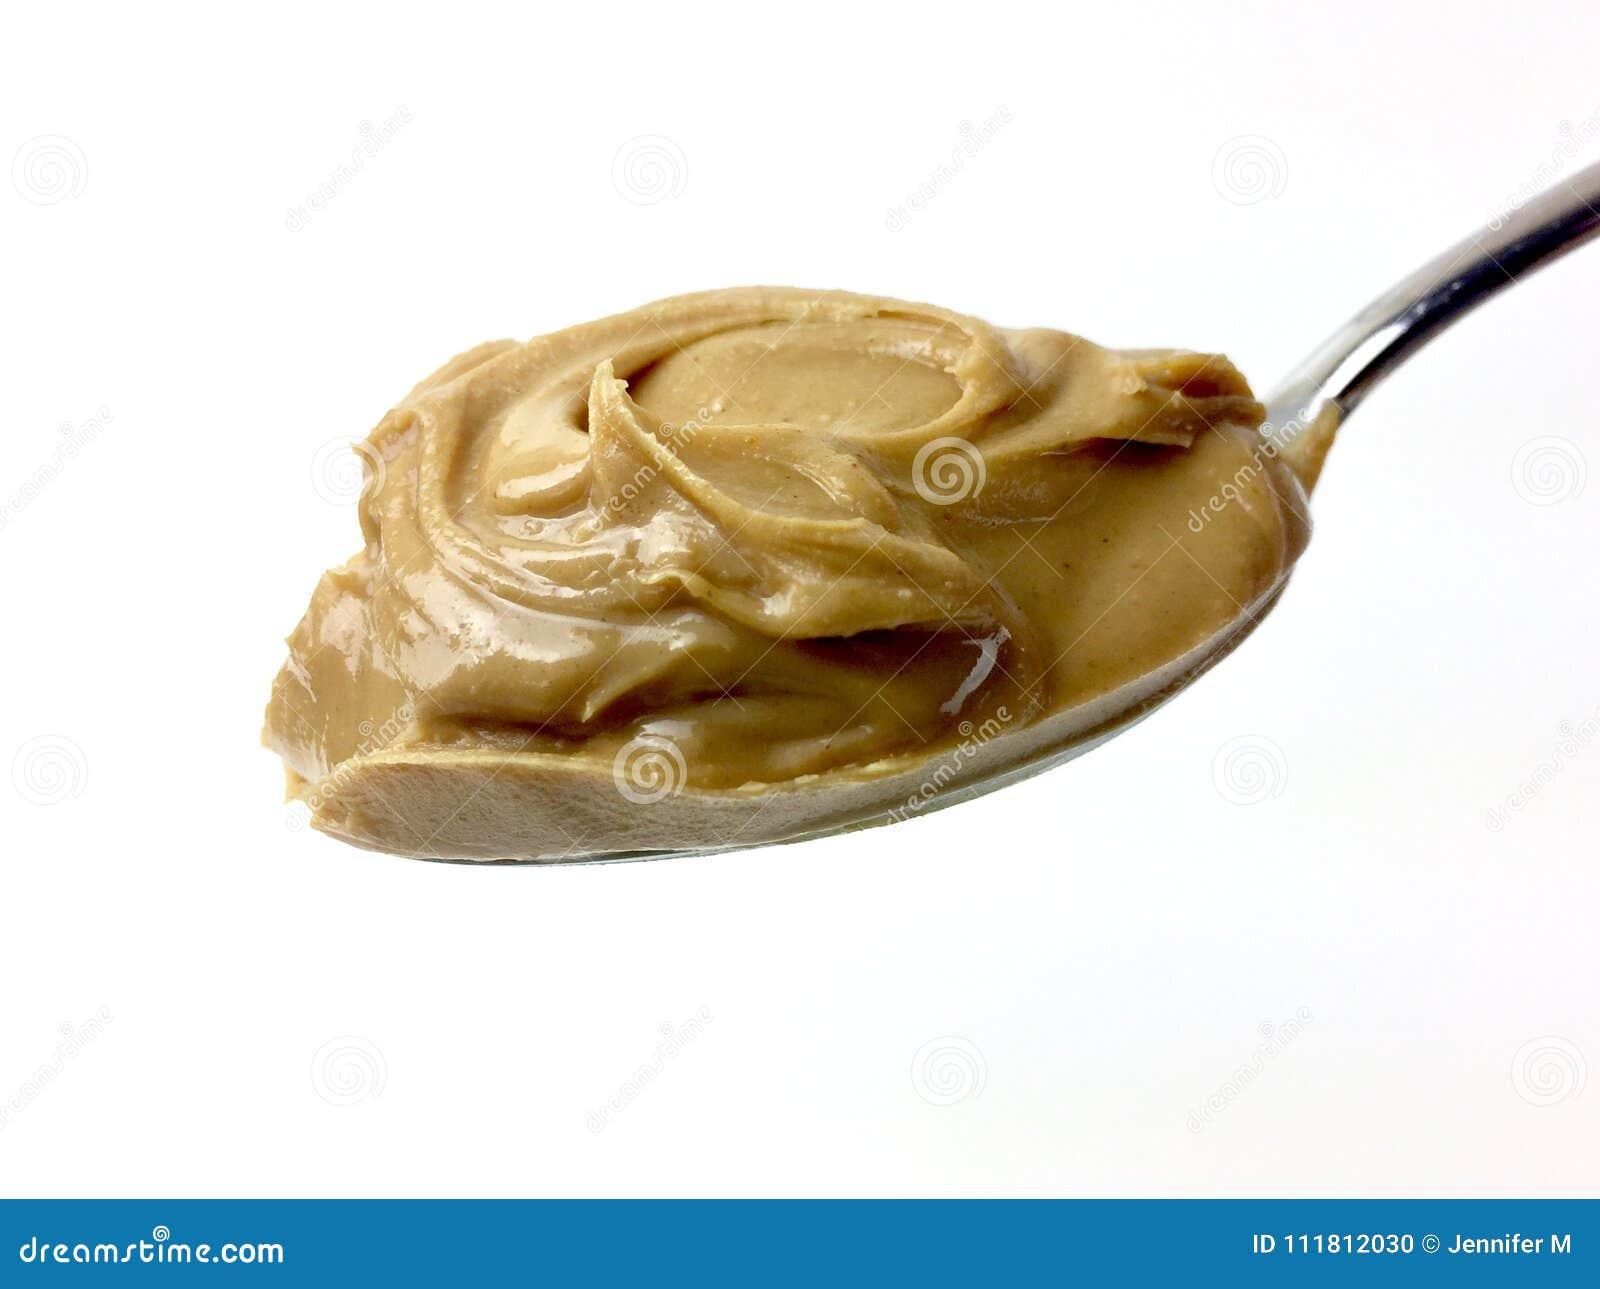 Spoonful of creamy peanut butter